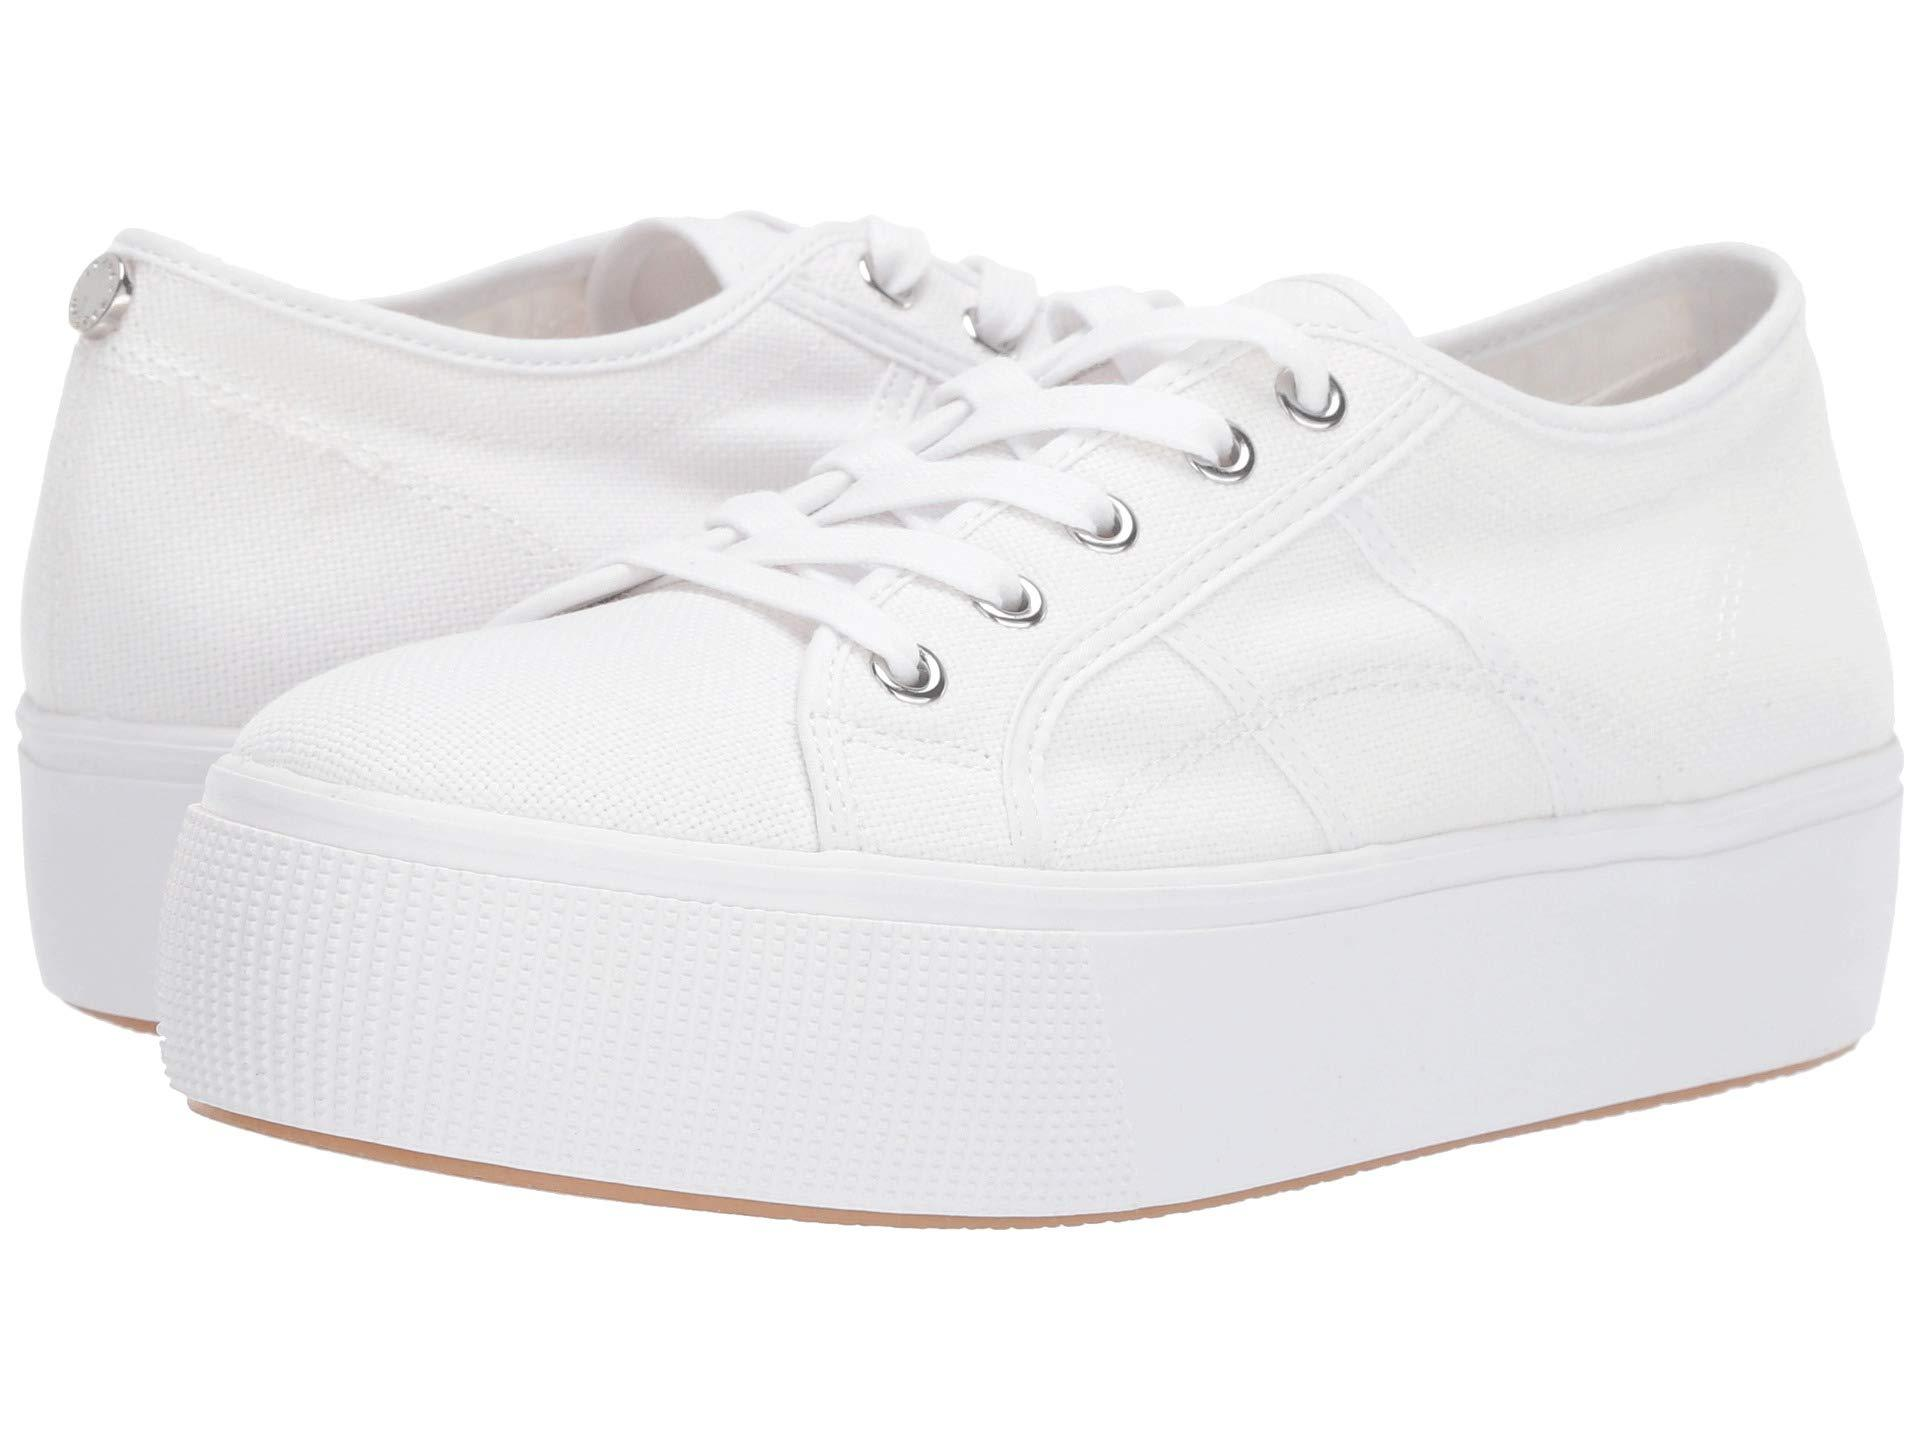 5cf8121071a Lyst - Steve Madden Emmi Platform Sneaker (grey) Women s Shoes in White